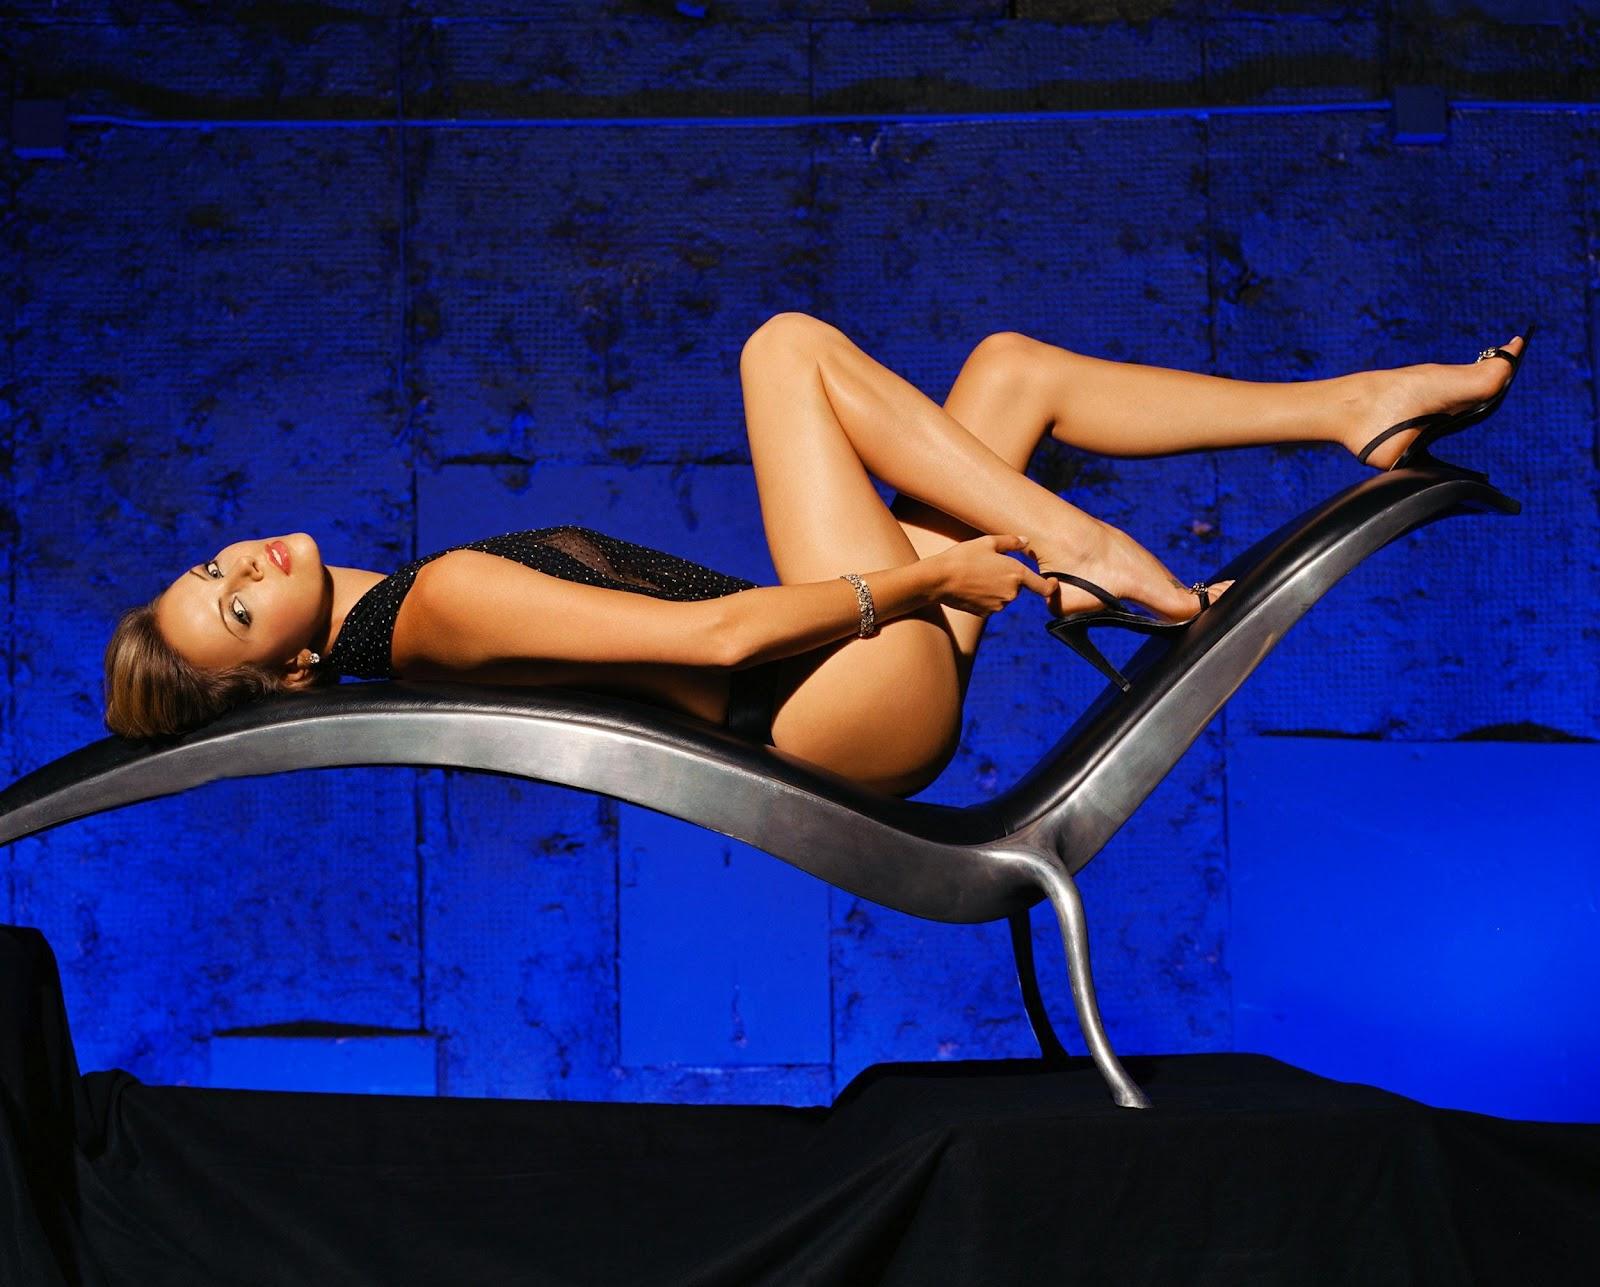 http://2.bp.blogspot.com/-gVO_Xt2f_WY/T8DVGR69FSI/AAAAAAAABgo/iek_BMRTqUY/s1600/Charlize-Theron-Legs-Sexy.jpg